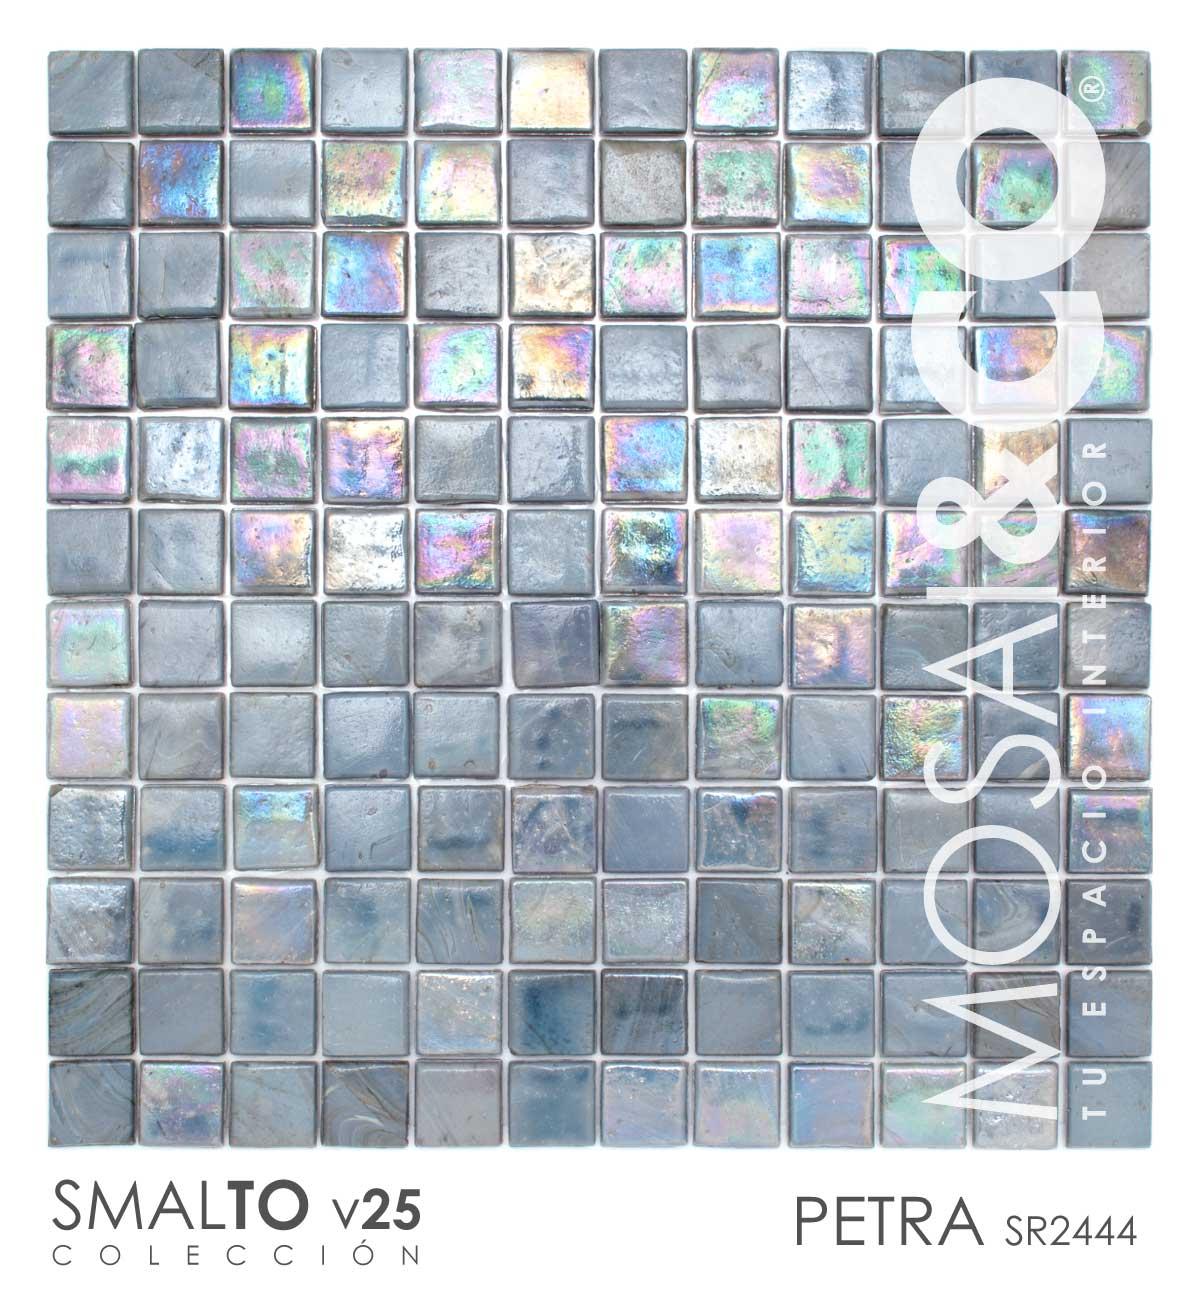 mosaico-interiores-mosaiandco-smalto-v25-petra-sr2444